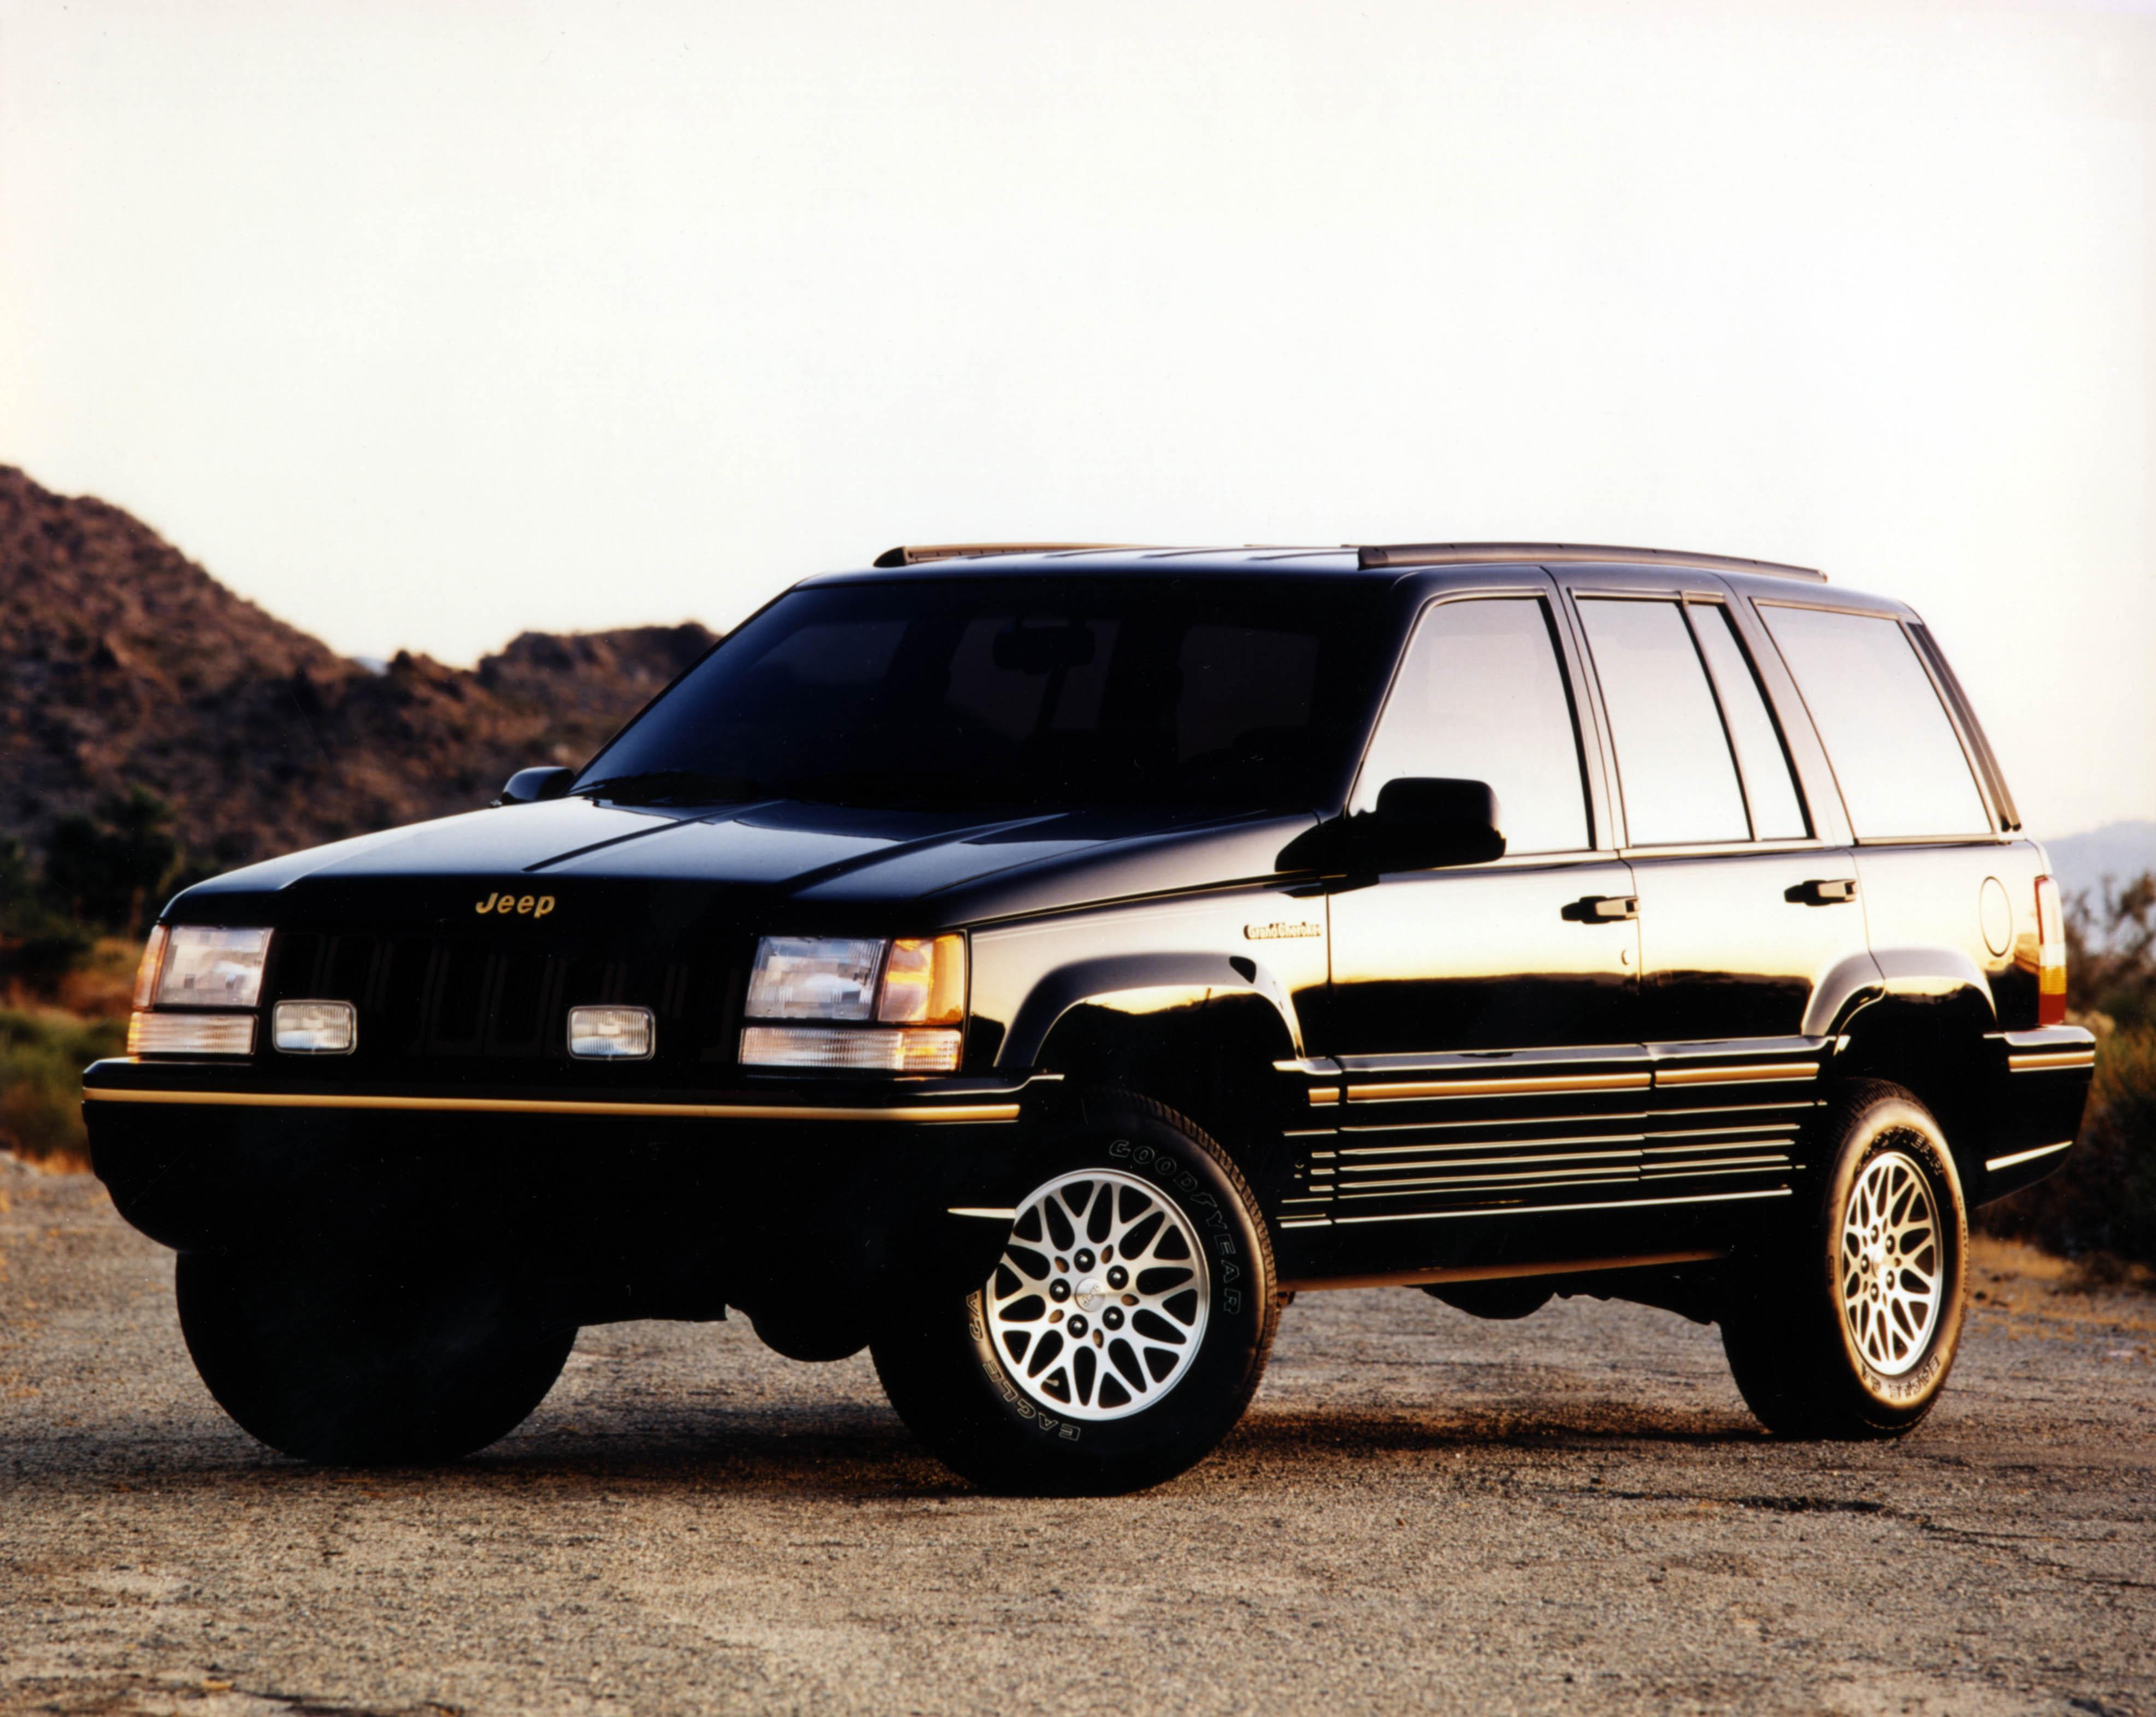 1994 Jeep Grand Cherokee #2 Jeep Grand Cherokee #2